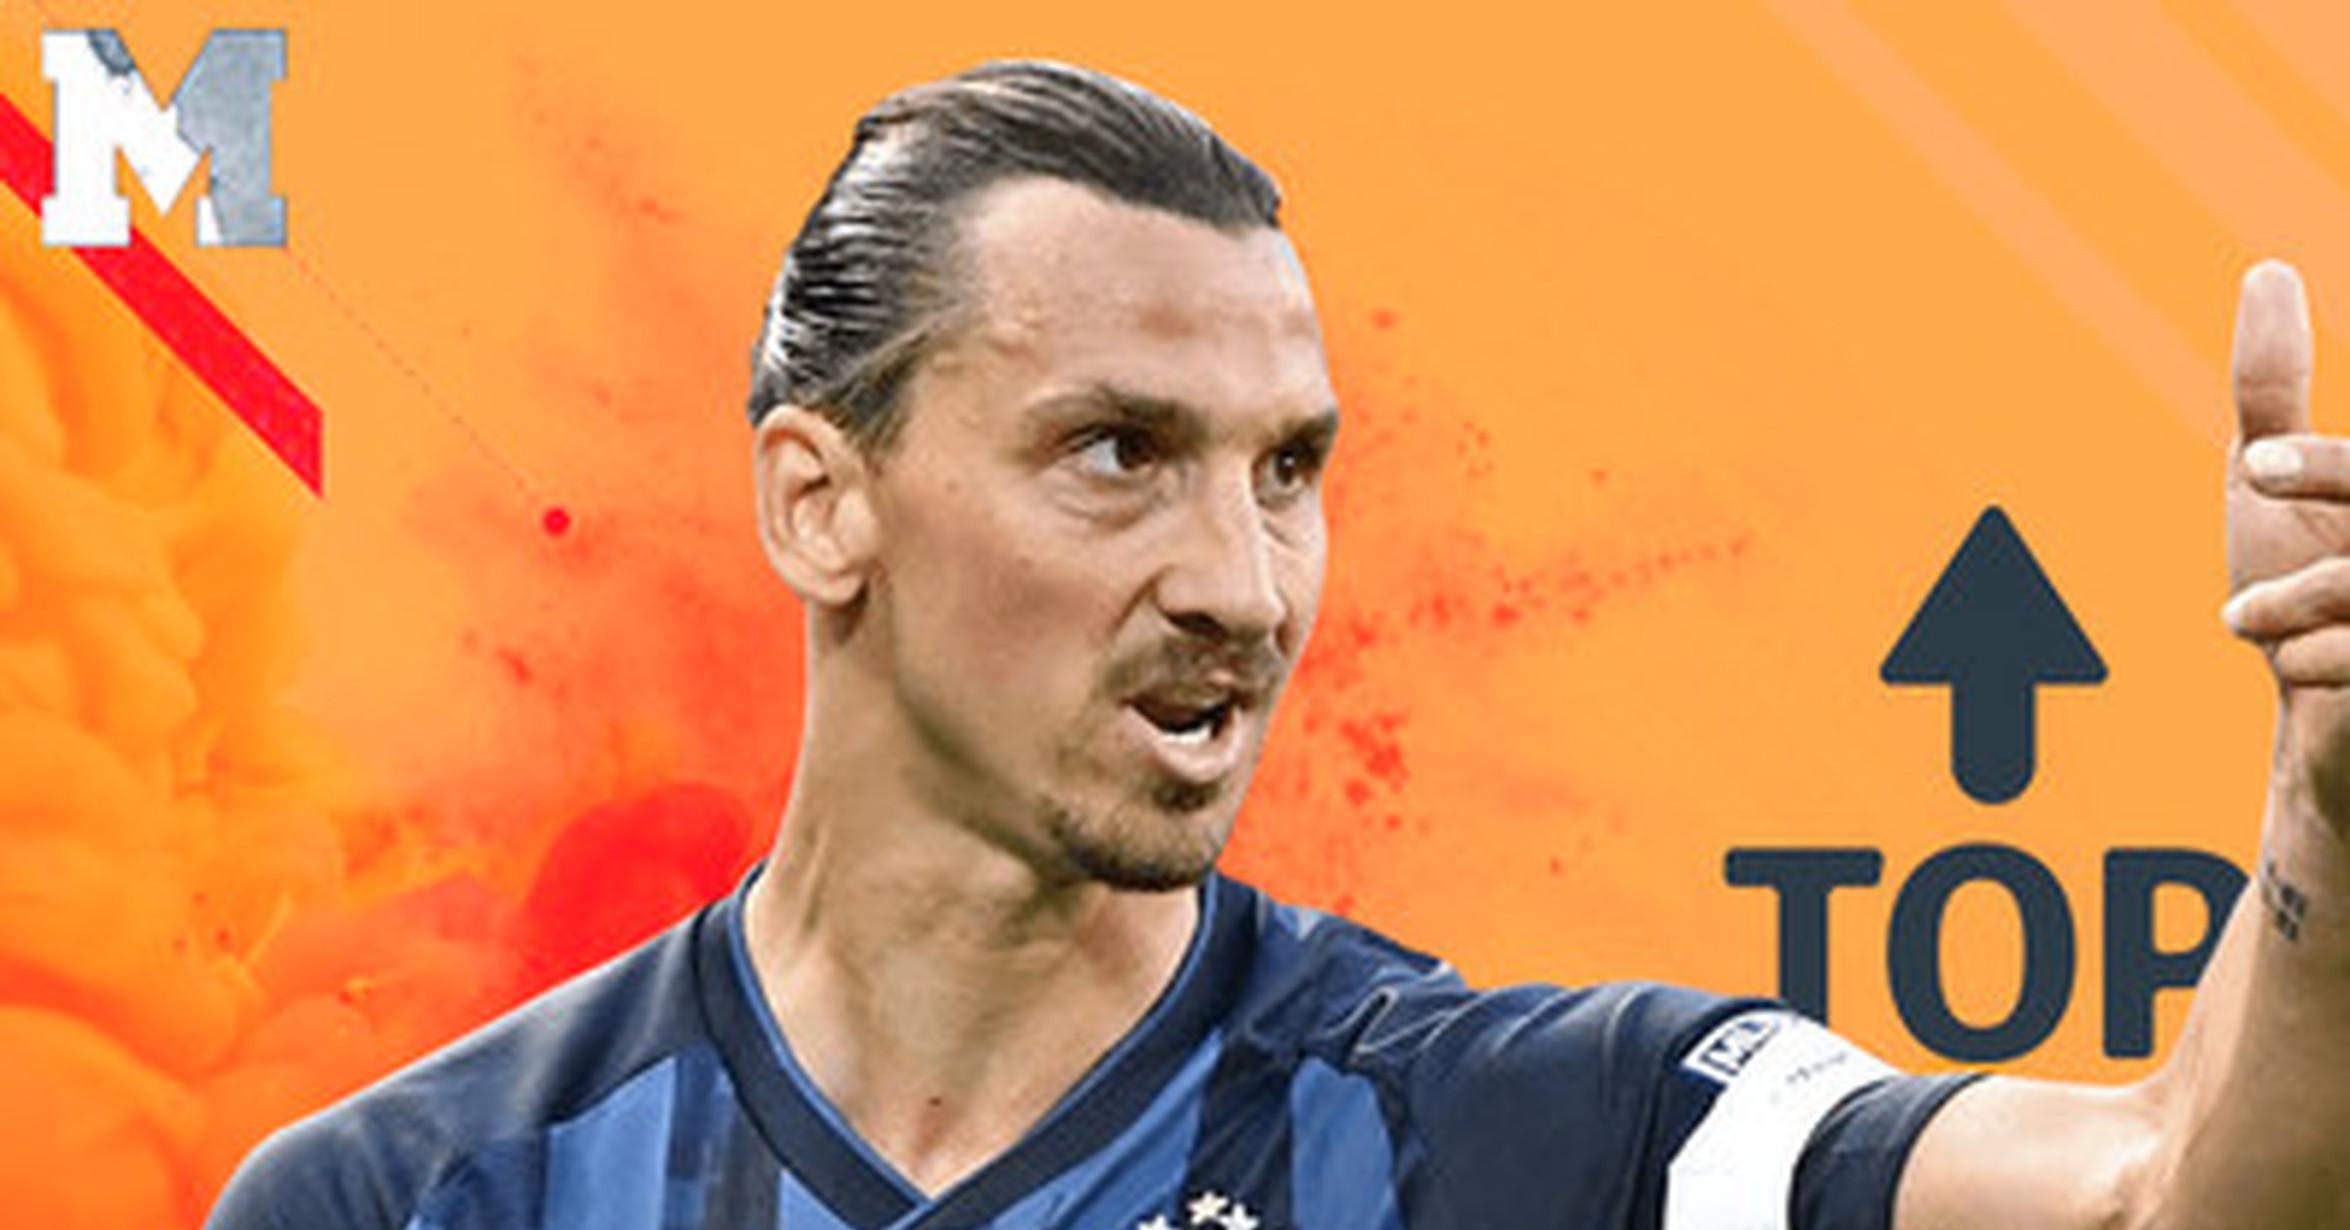 Memedeportes Las 10 Mejores Frases De Zlatan Ibrahimovic A